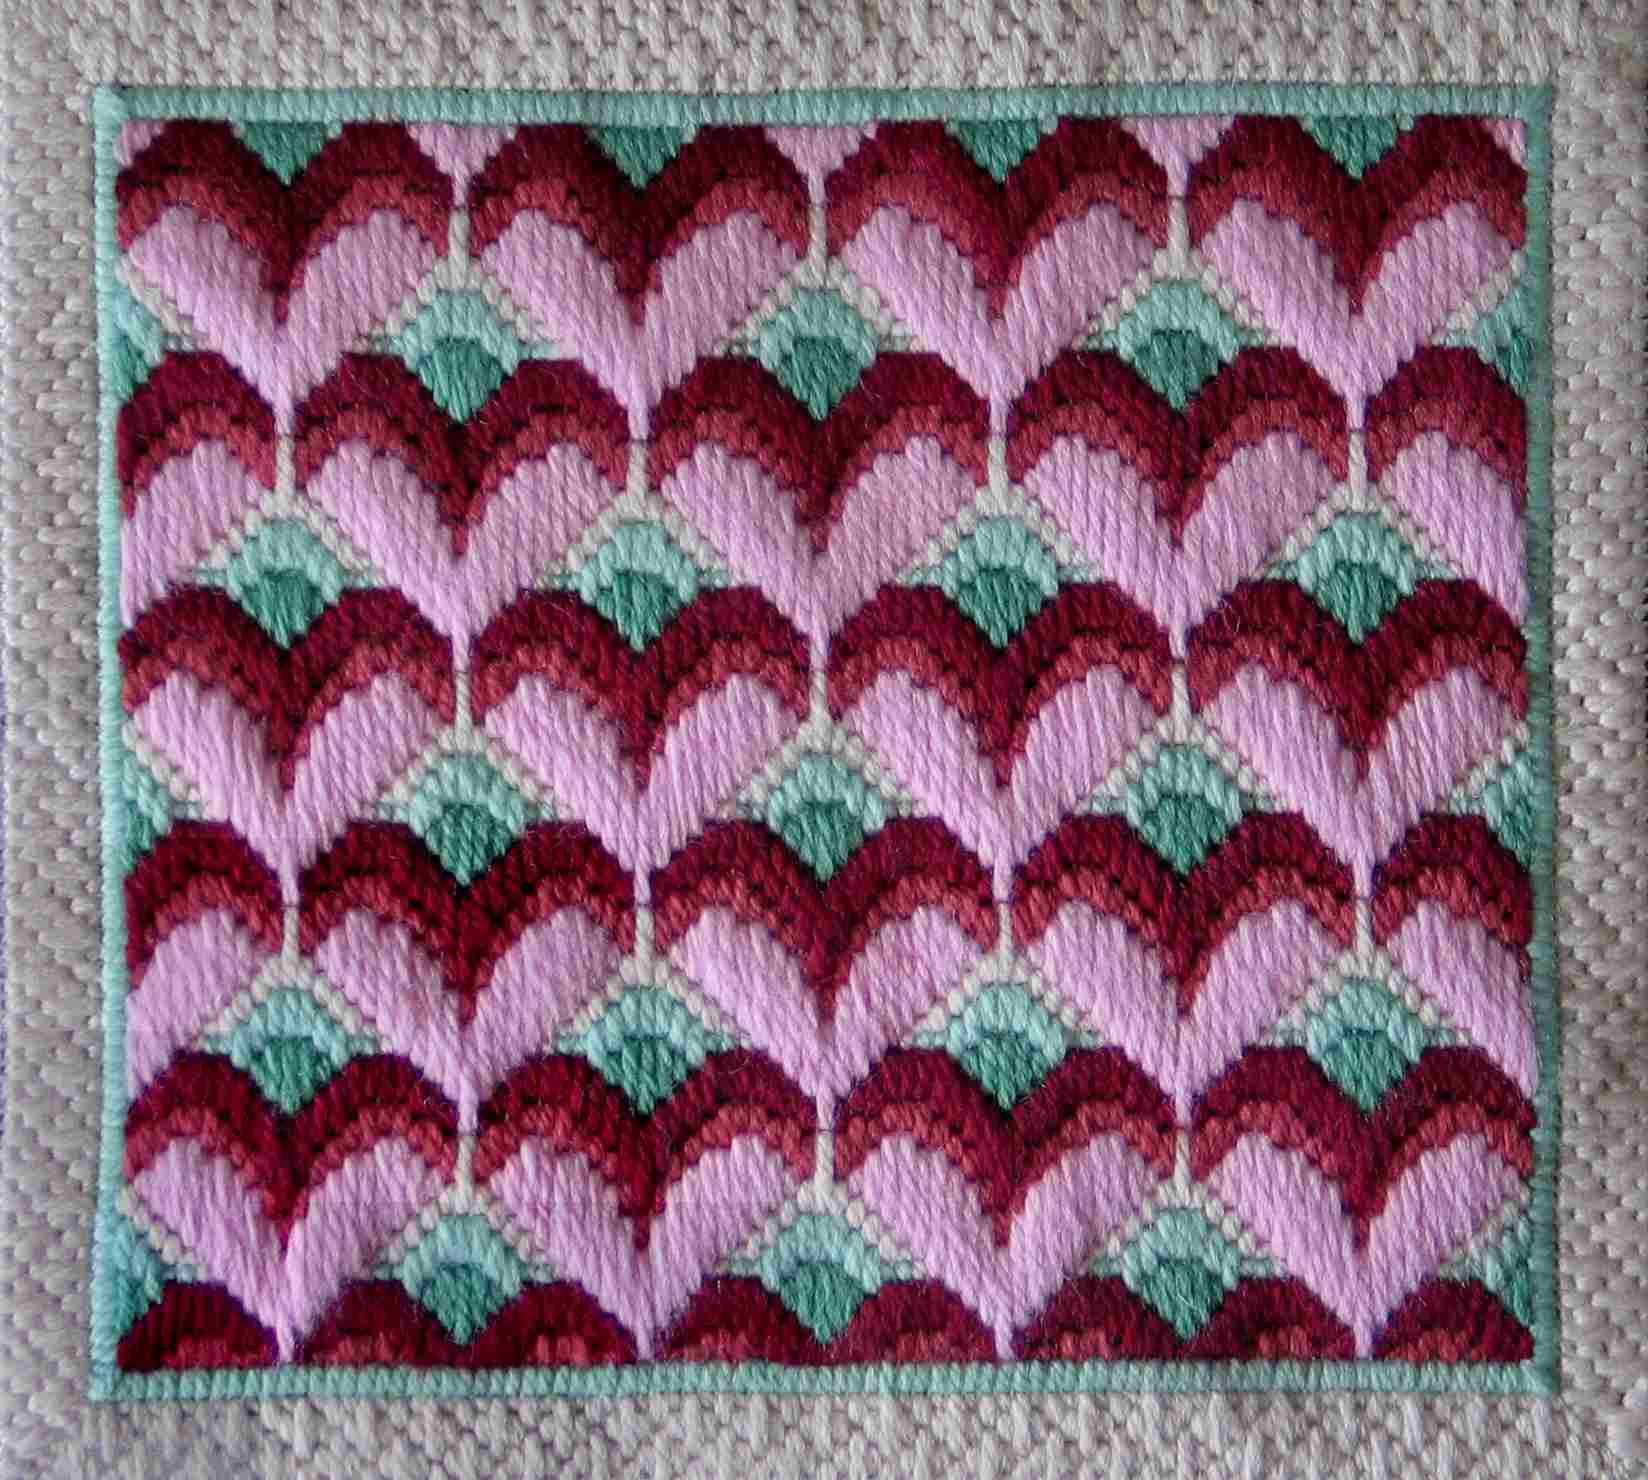 Stitched Bargello Hearts Needlepoint Pattern